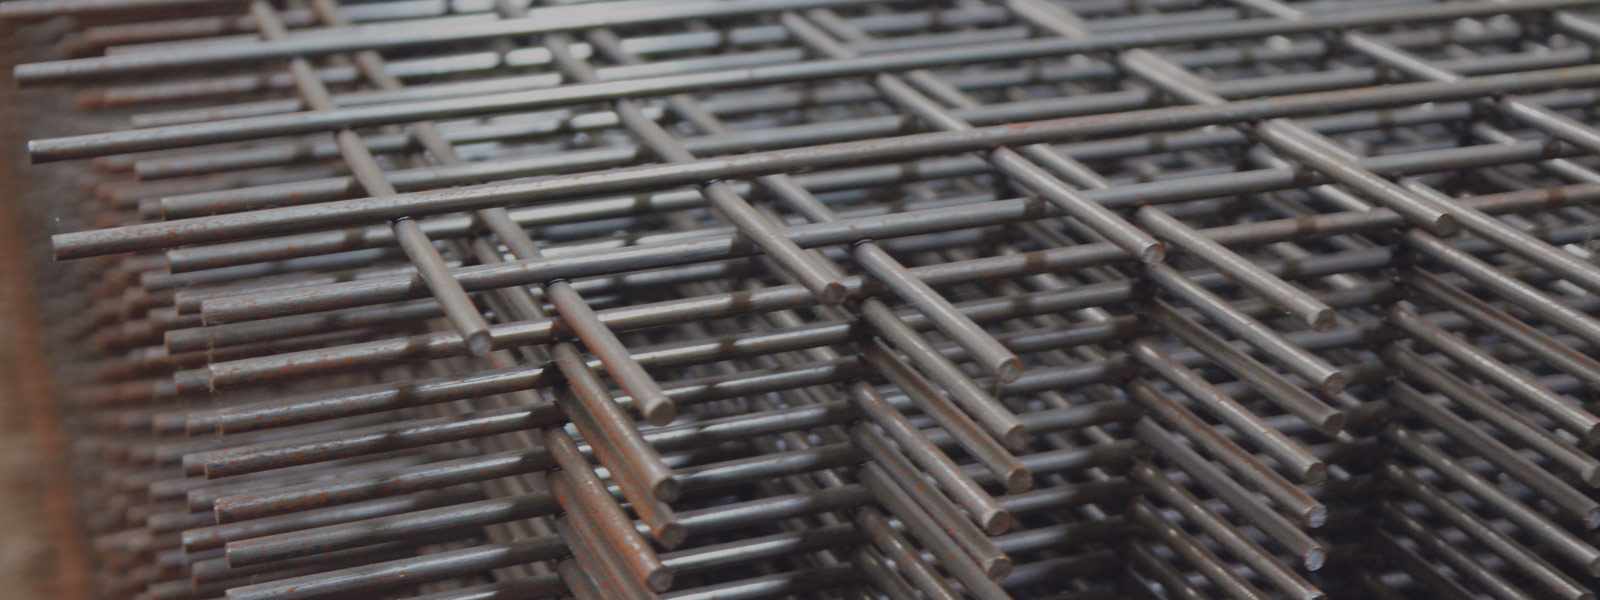 Bouwstaalmatten en betonijzer